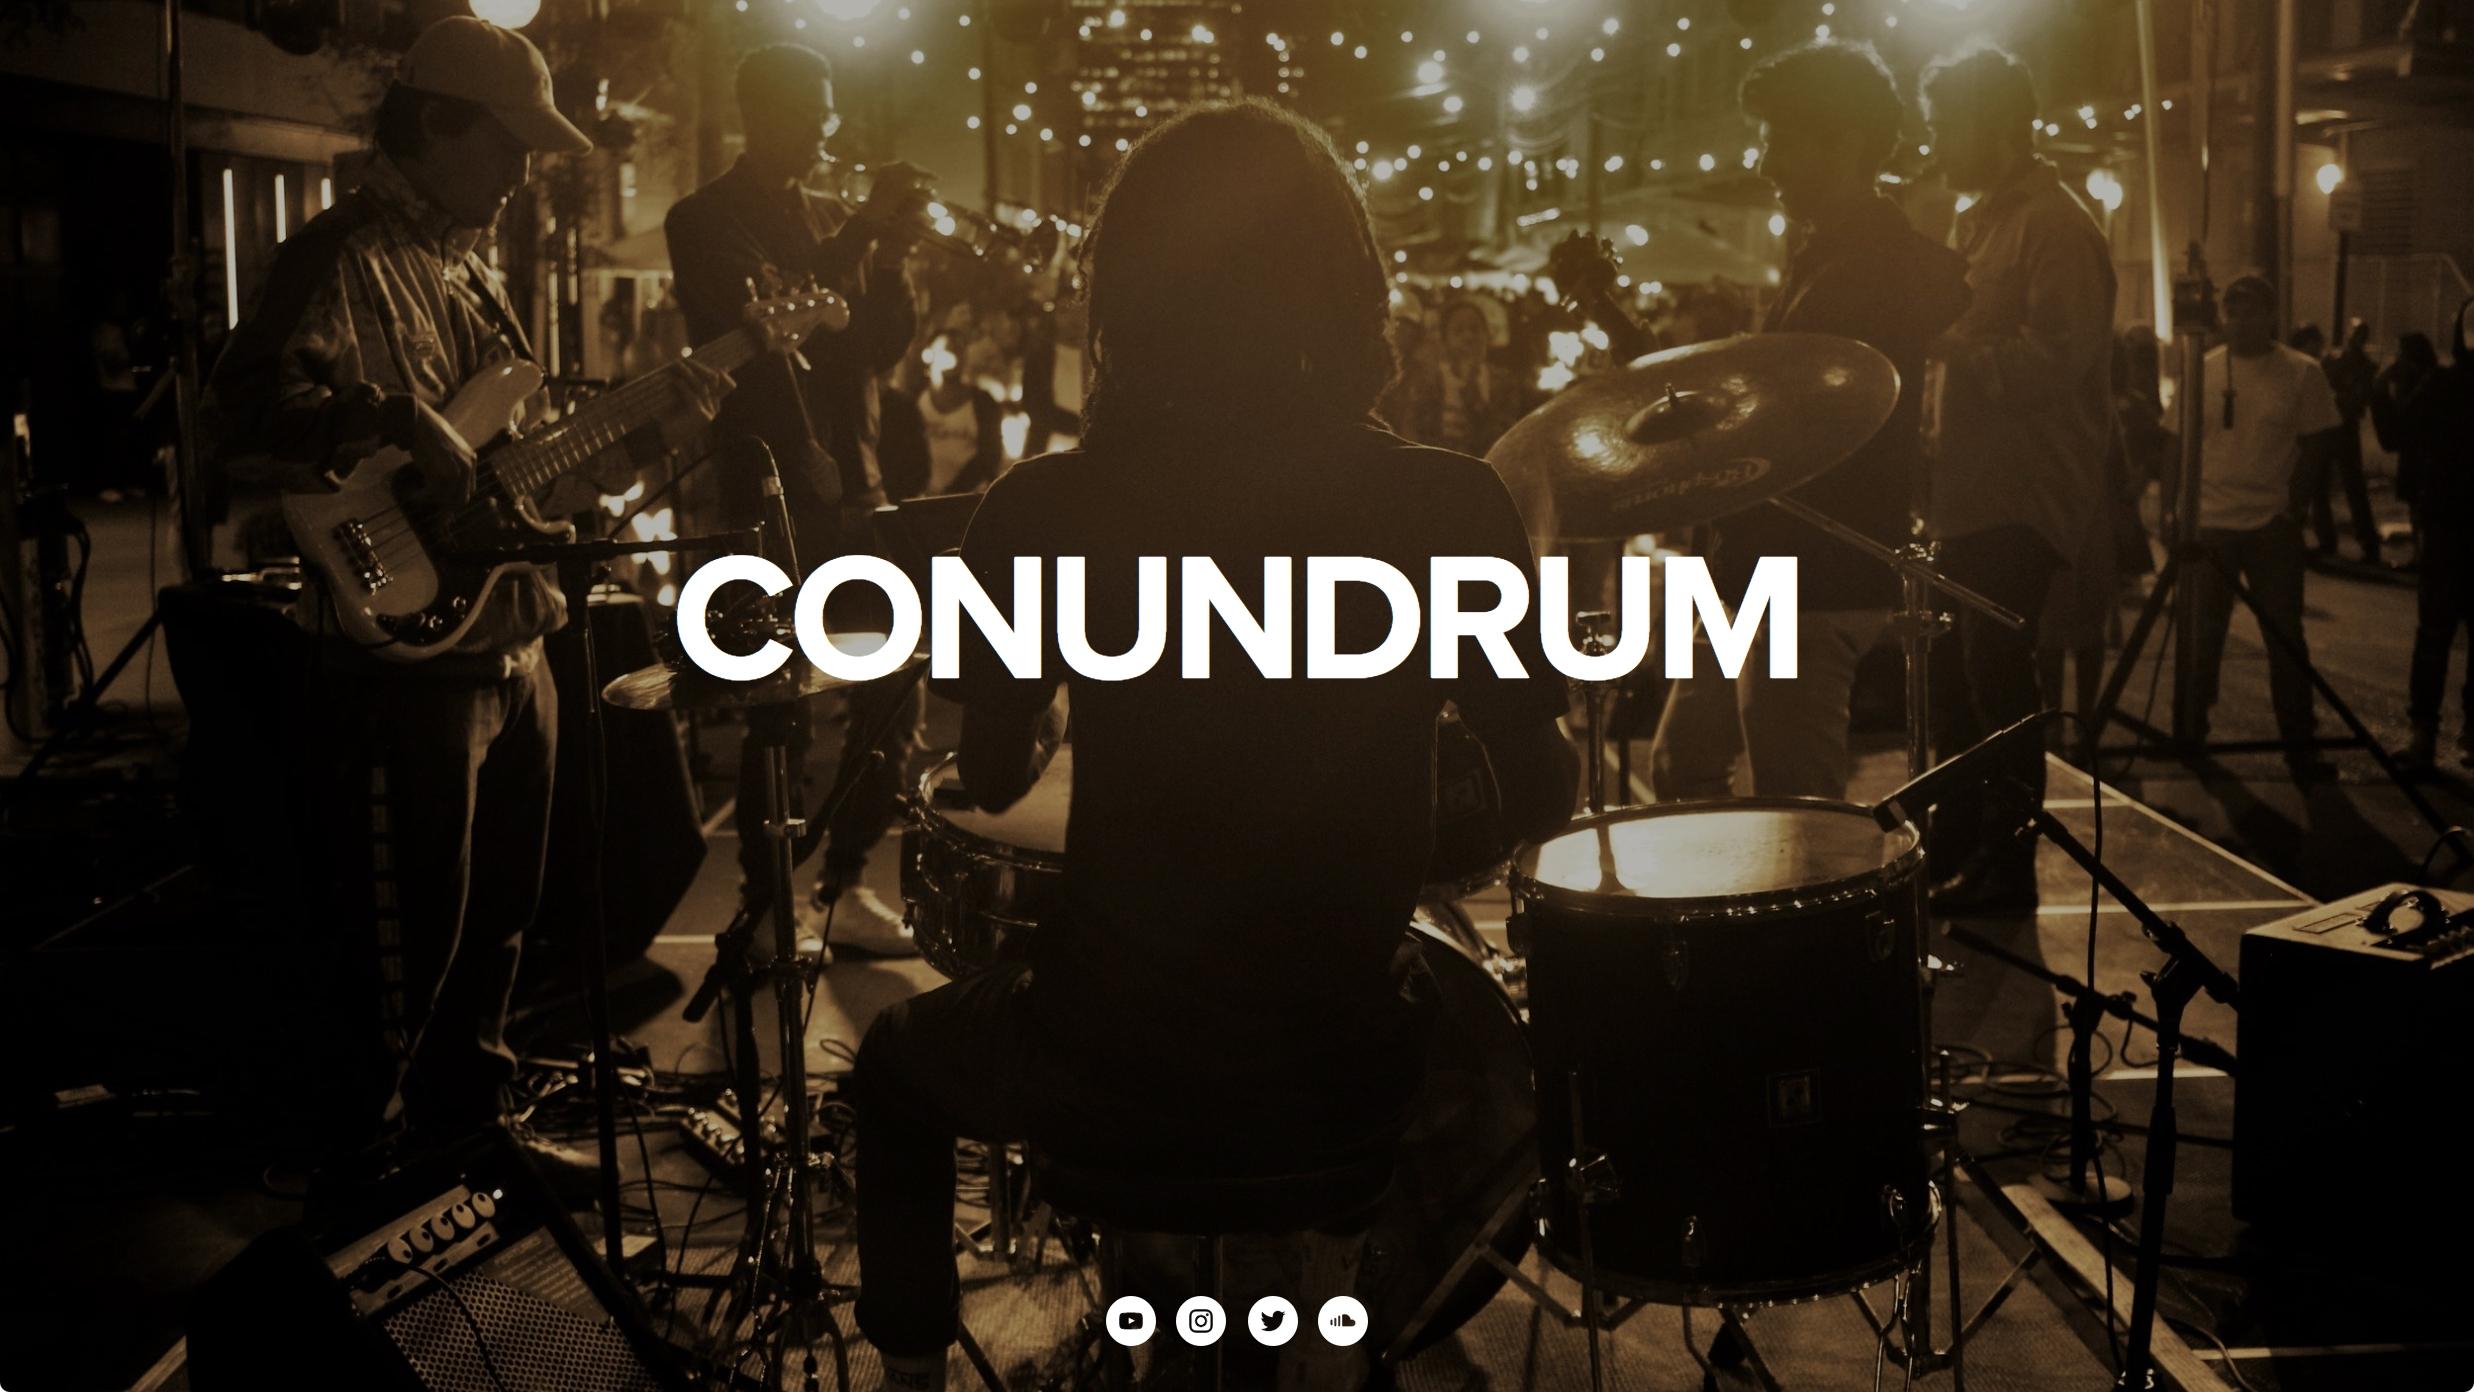 http://www.conundrumtv.com/